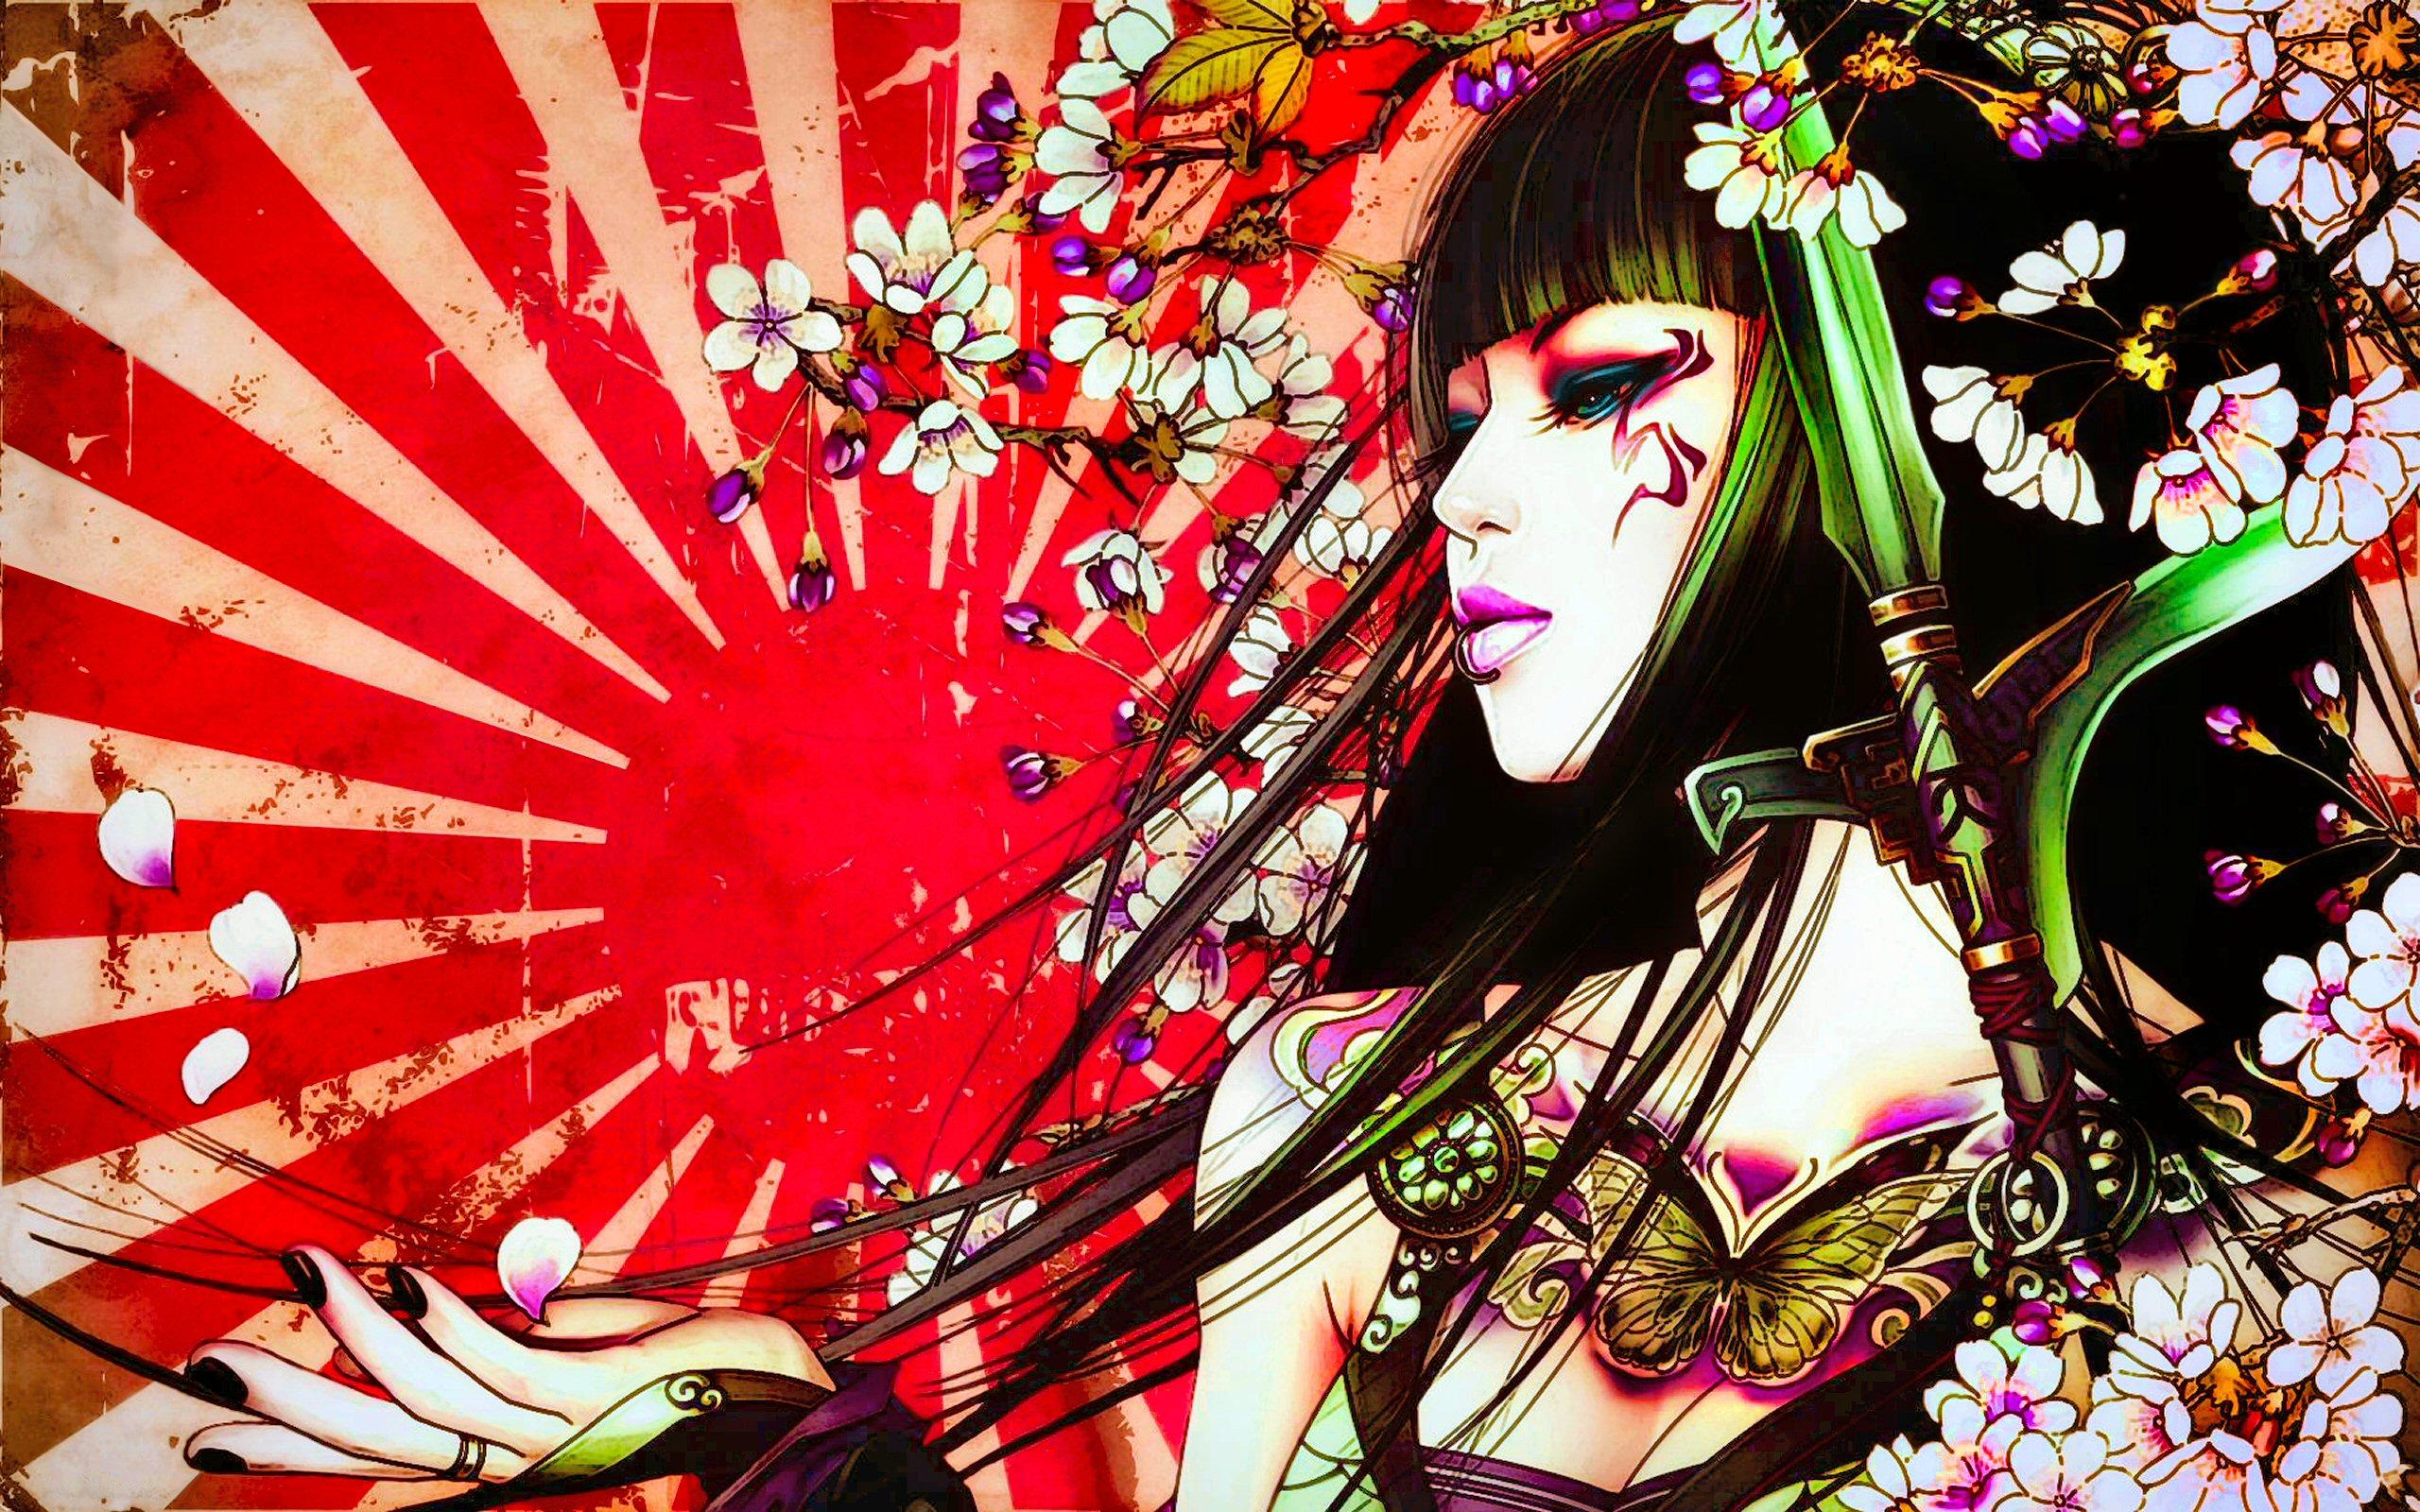 Fantasy Geisha Tattoo Petal Japan Sun Fantasy Asian Artistic Oriental 2560x1600